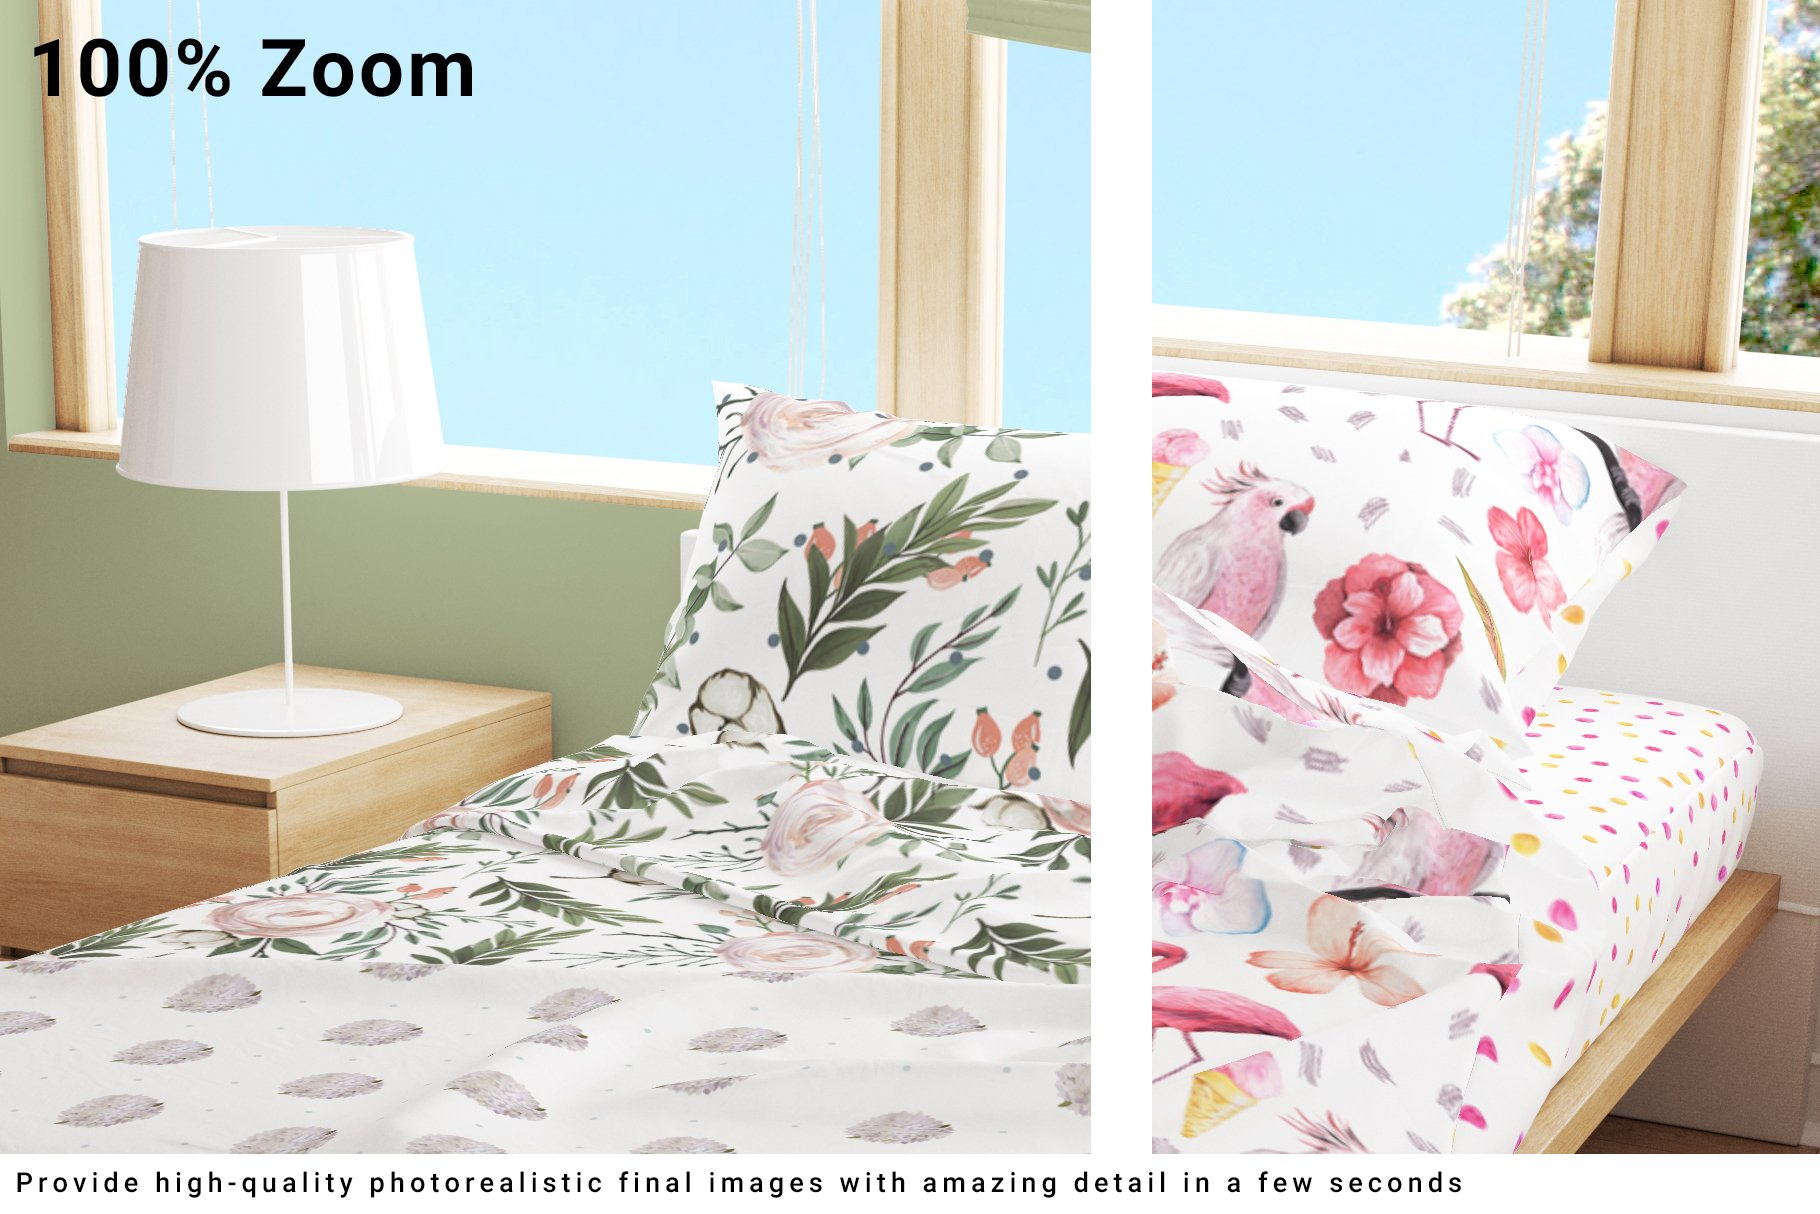 Bedroom Set - Bedding & Throw Pillow example image 8